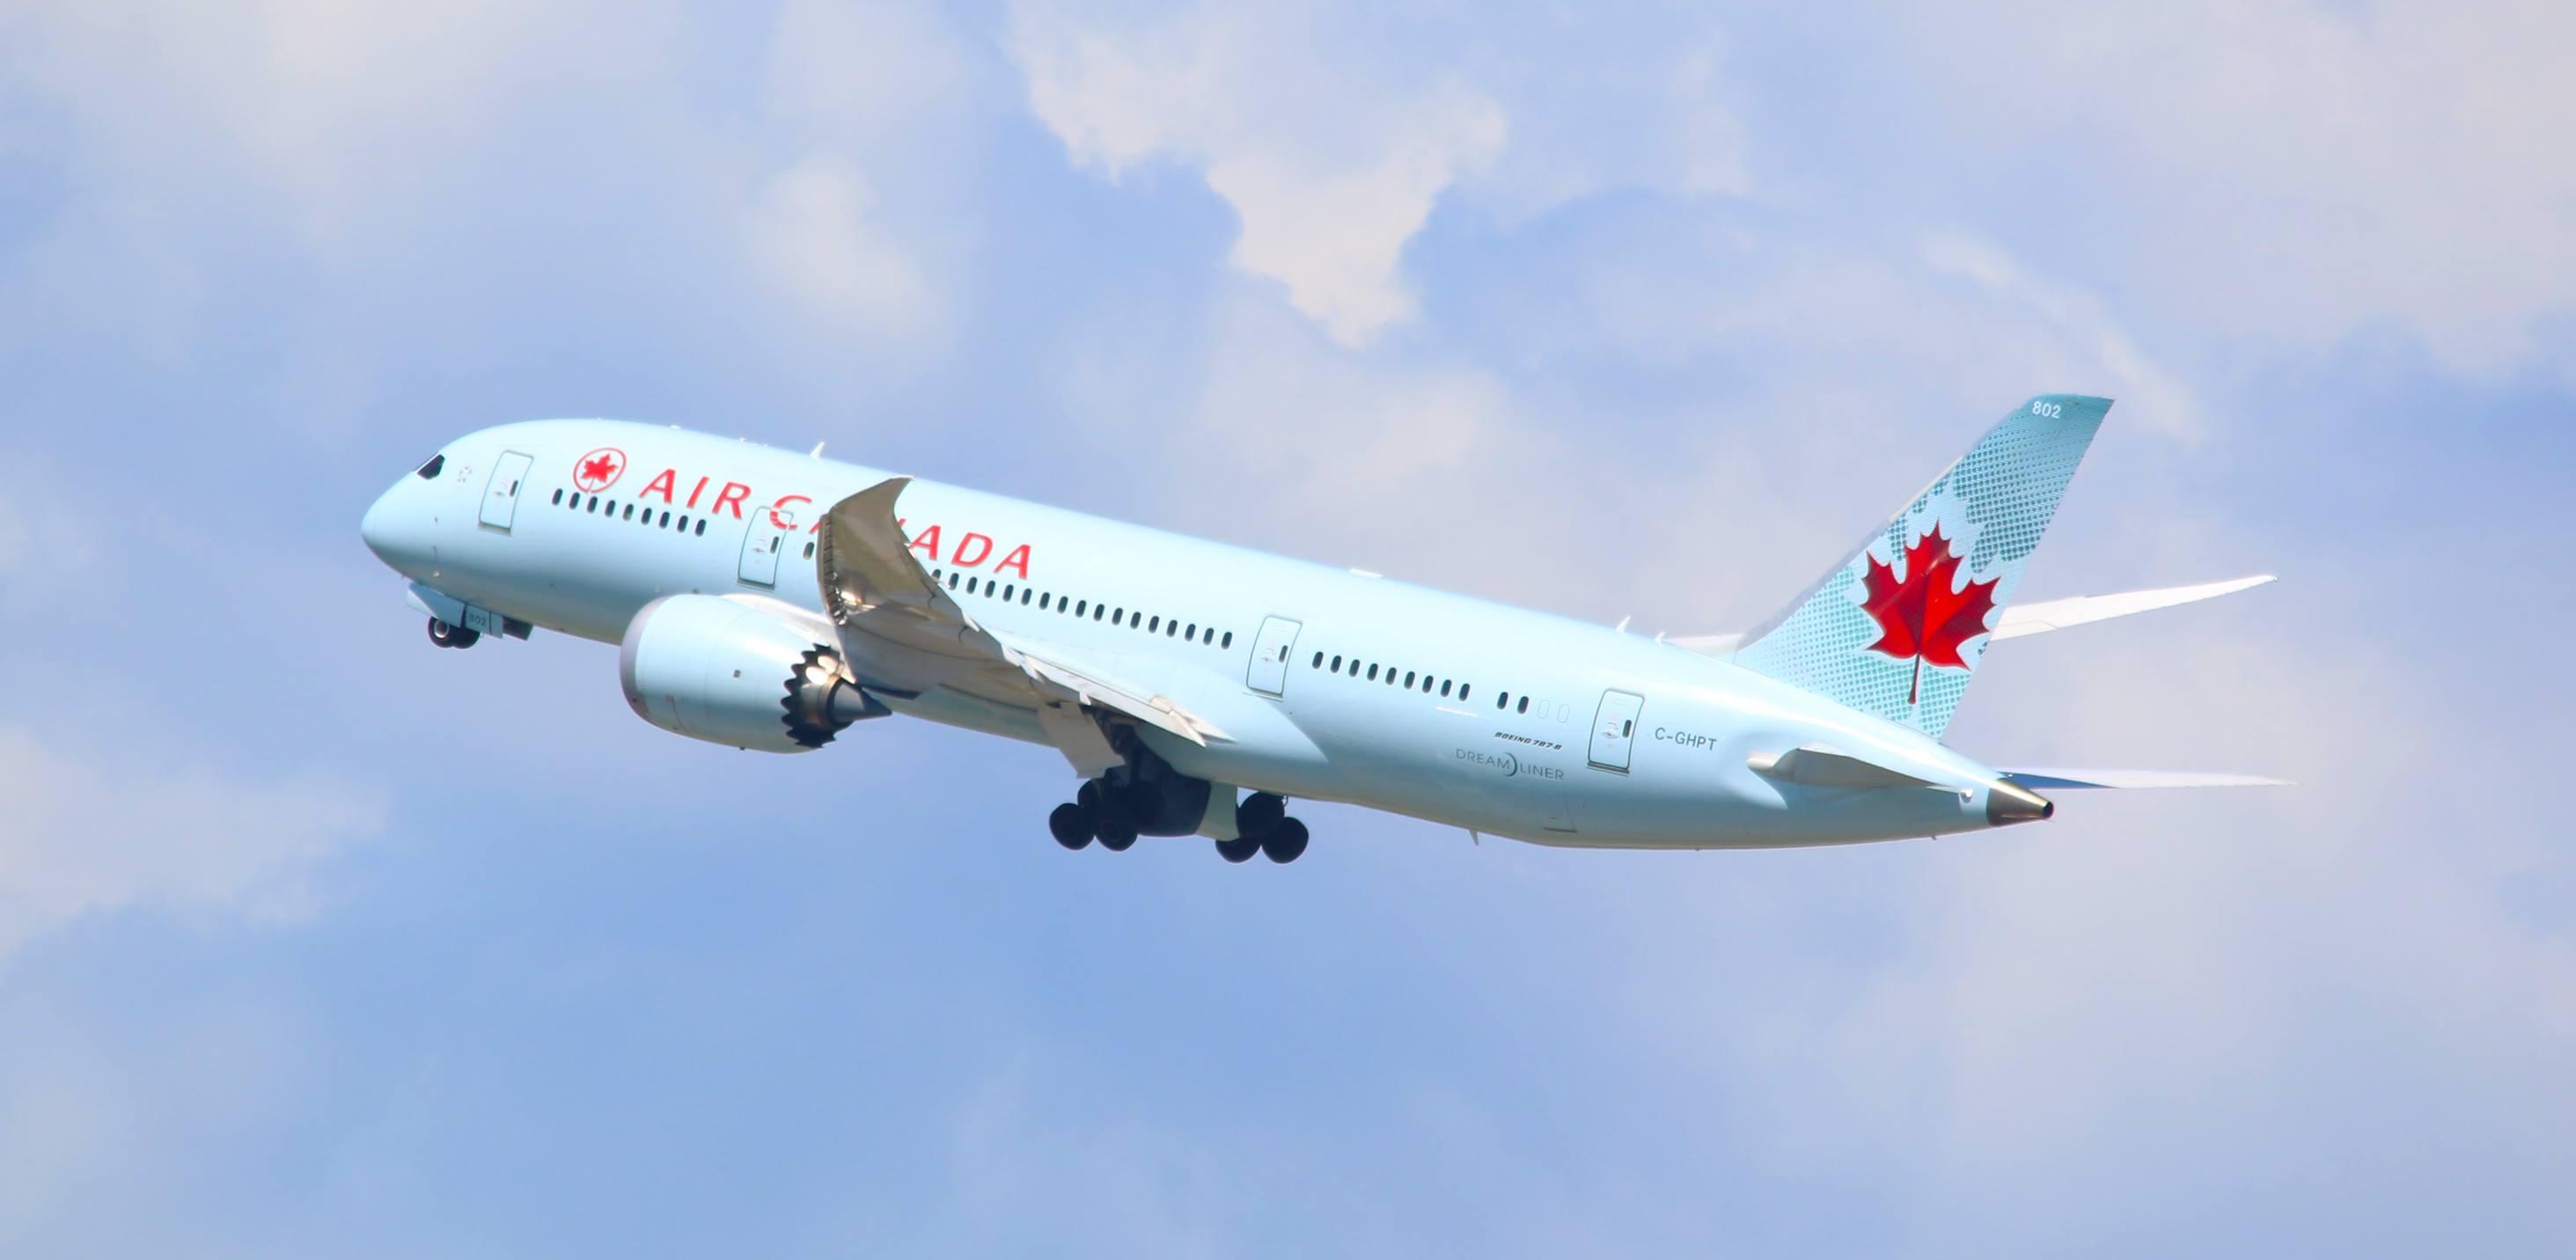 Air-Canada_Flight_Worldwide-Fare-Sale-on-Air-Canada